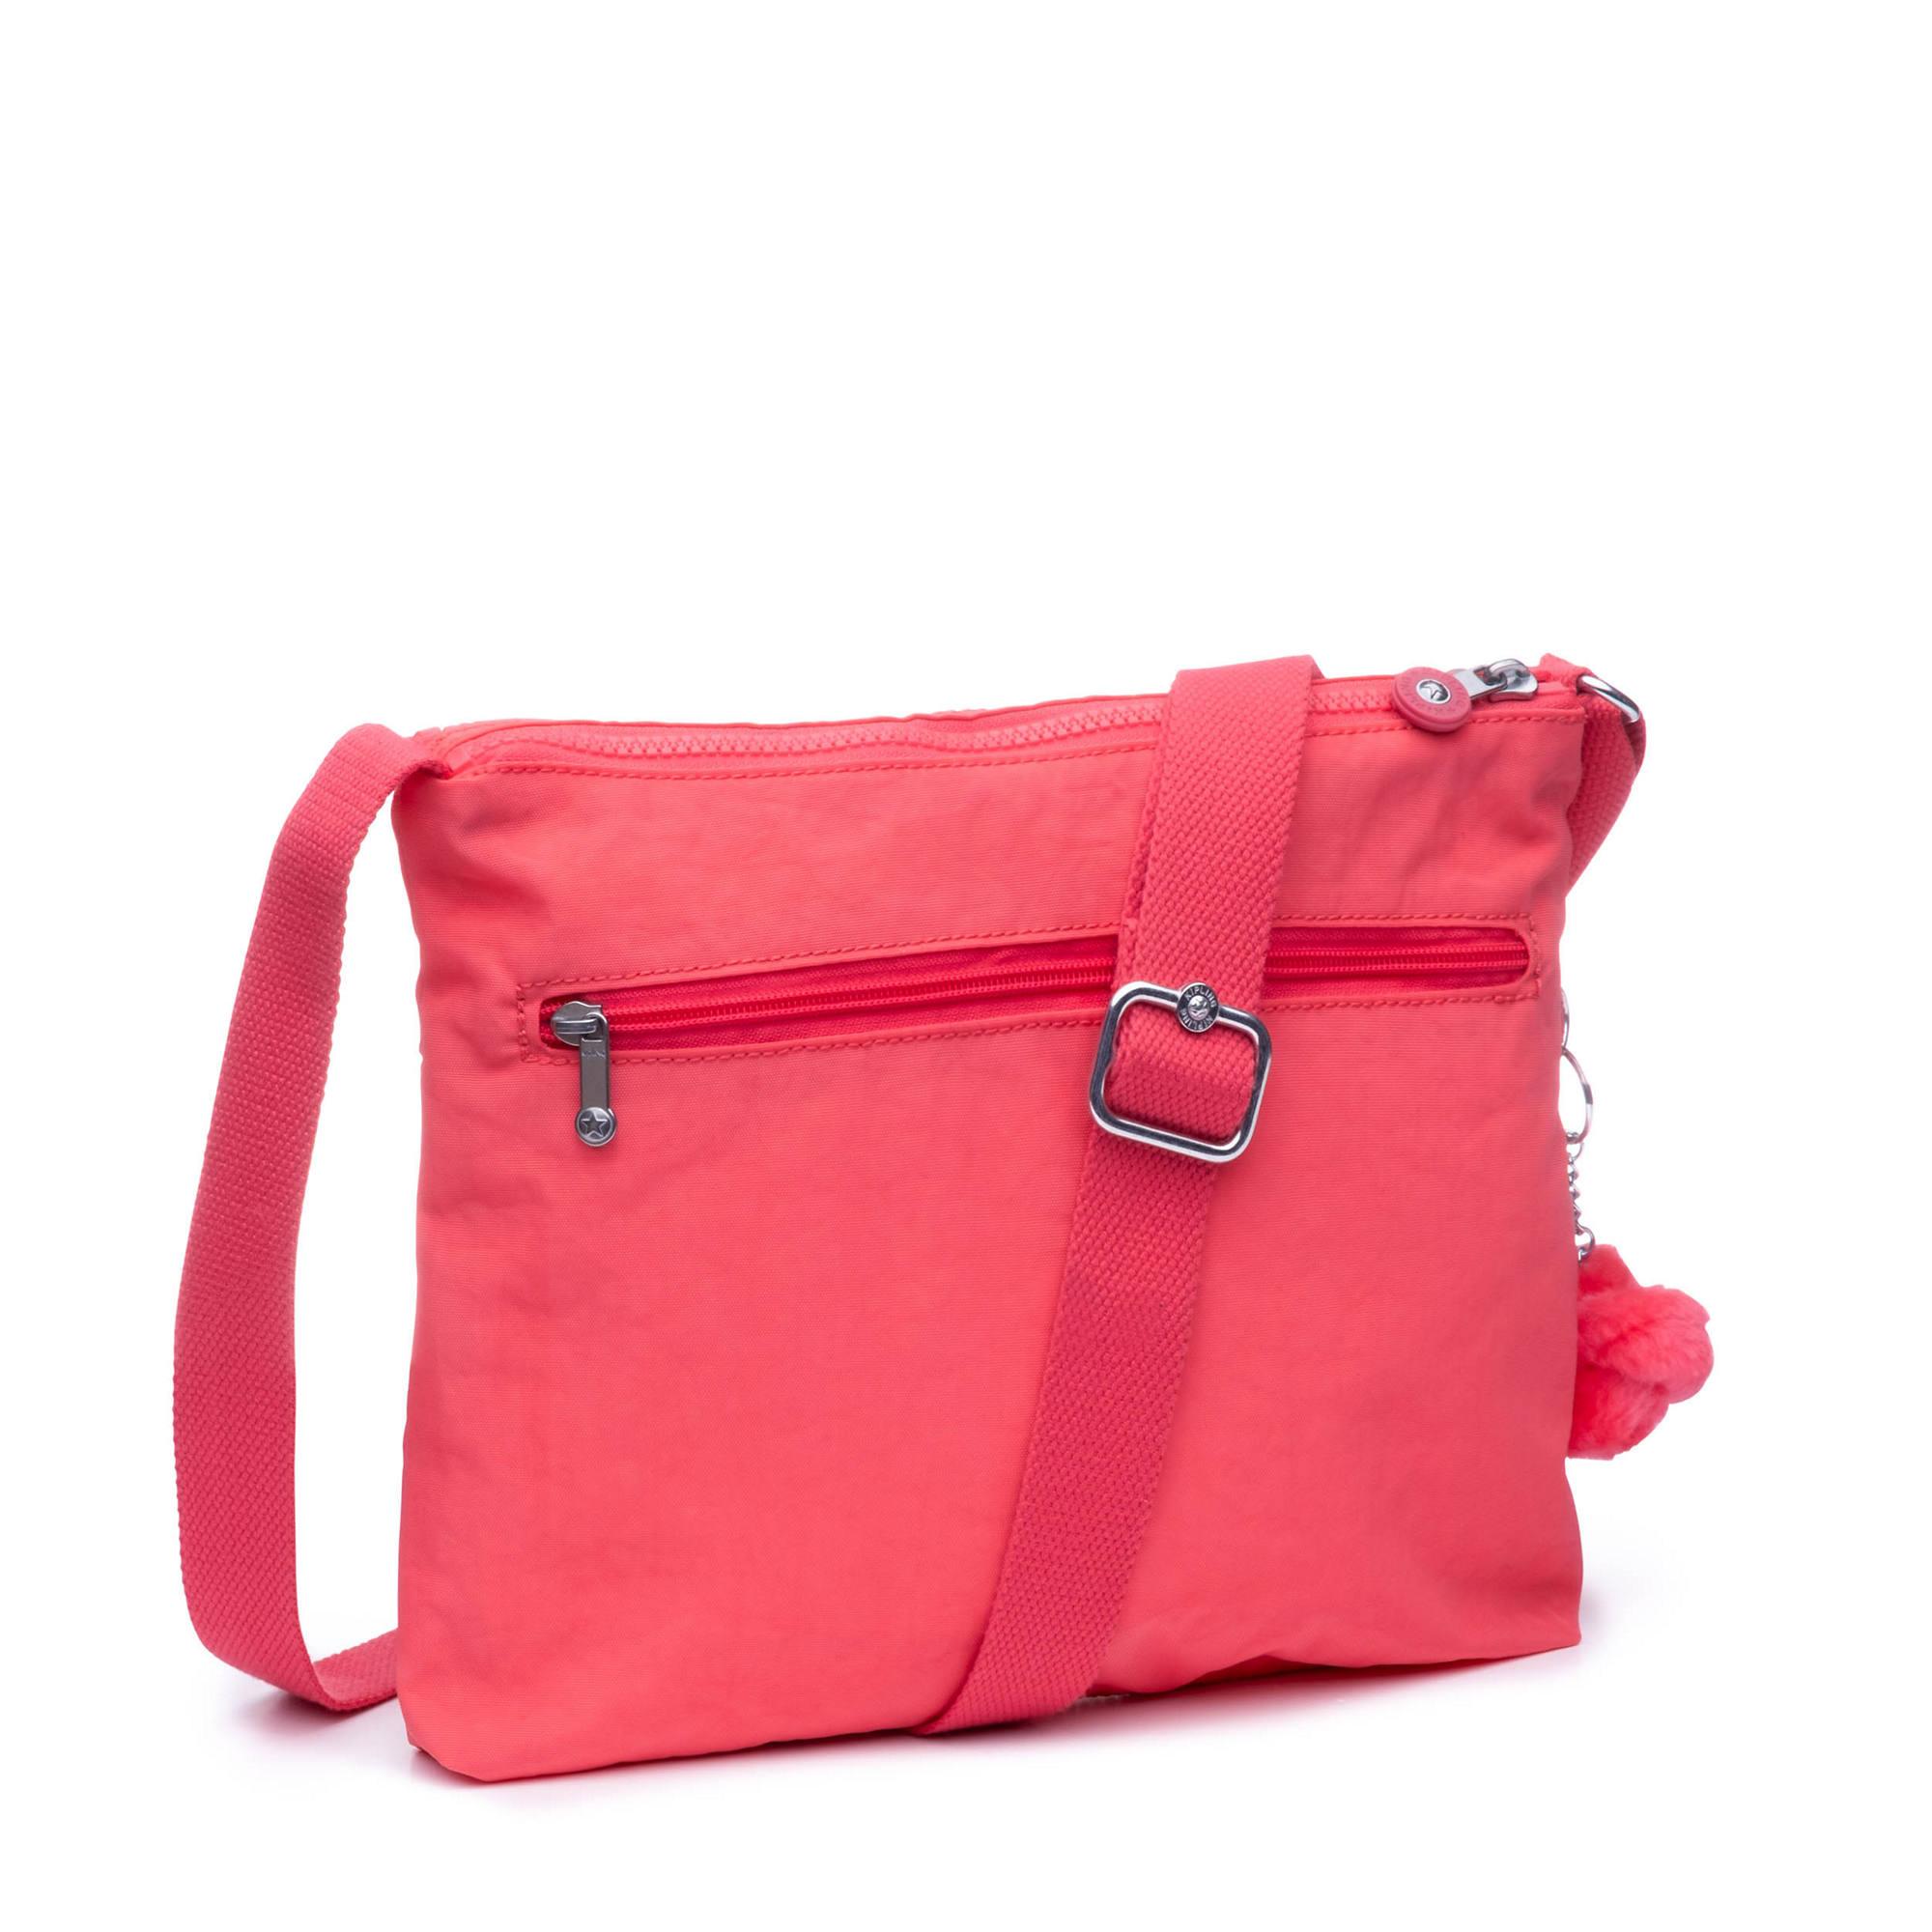 57eaf202b4292 Alvar Crossbody Bag